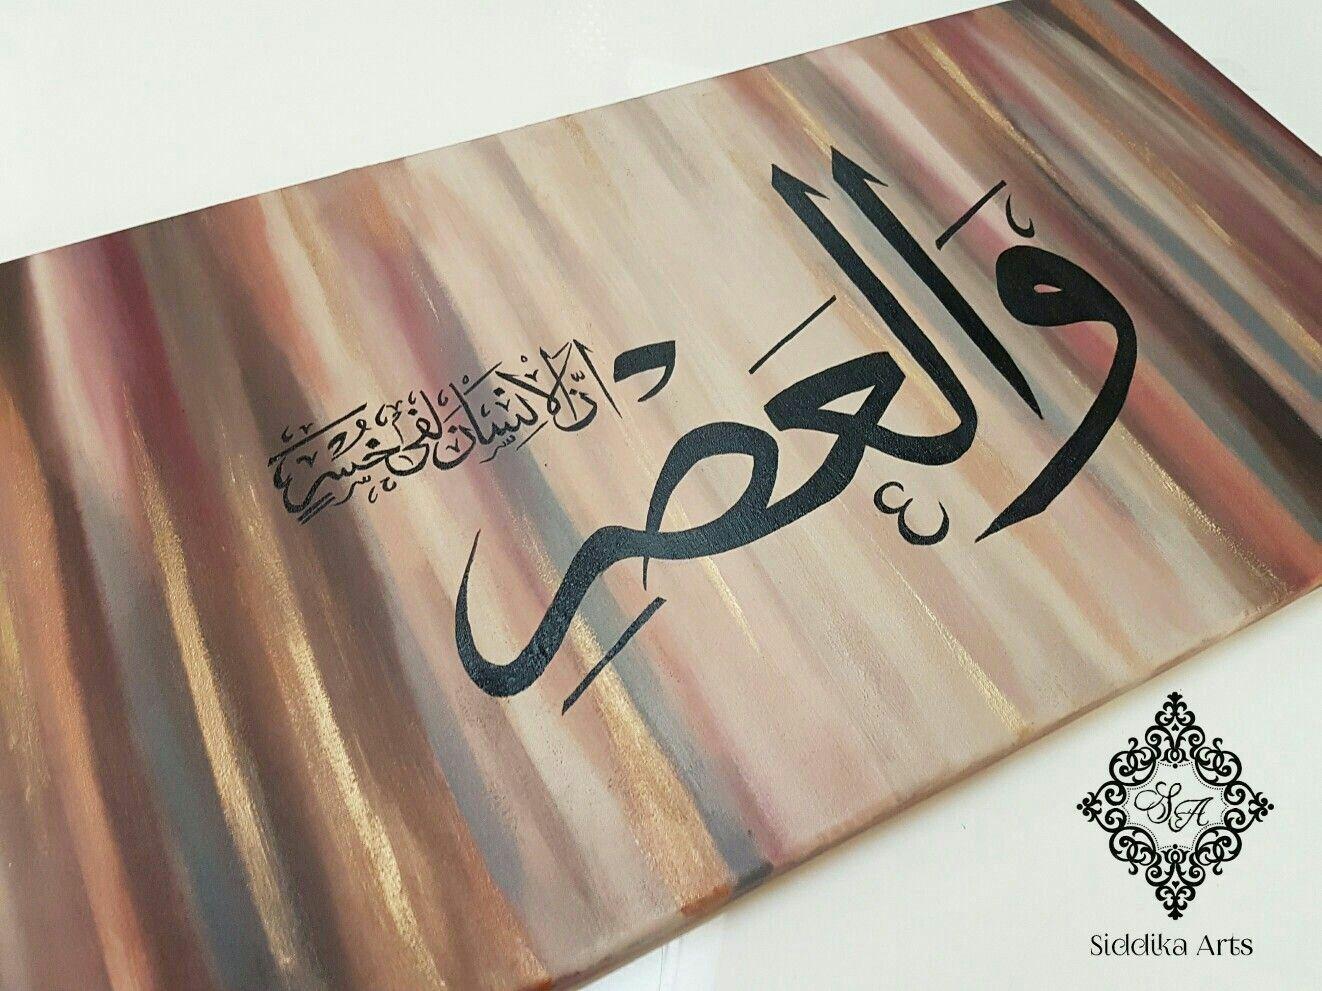 Pin By Arwa On Islam Inspiration In 2020 Islamic Caligraphy Art Islamic Calligraphy Painting Islamic Art Calligraphy